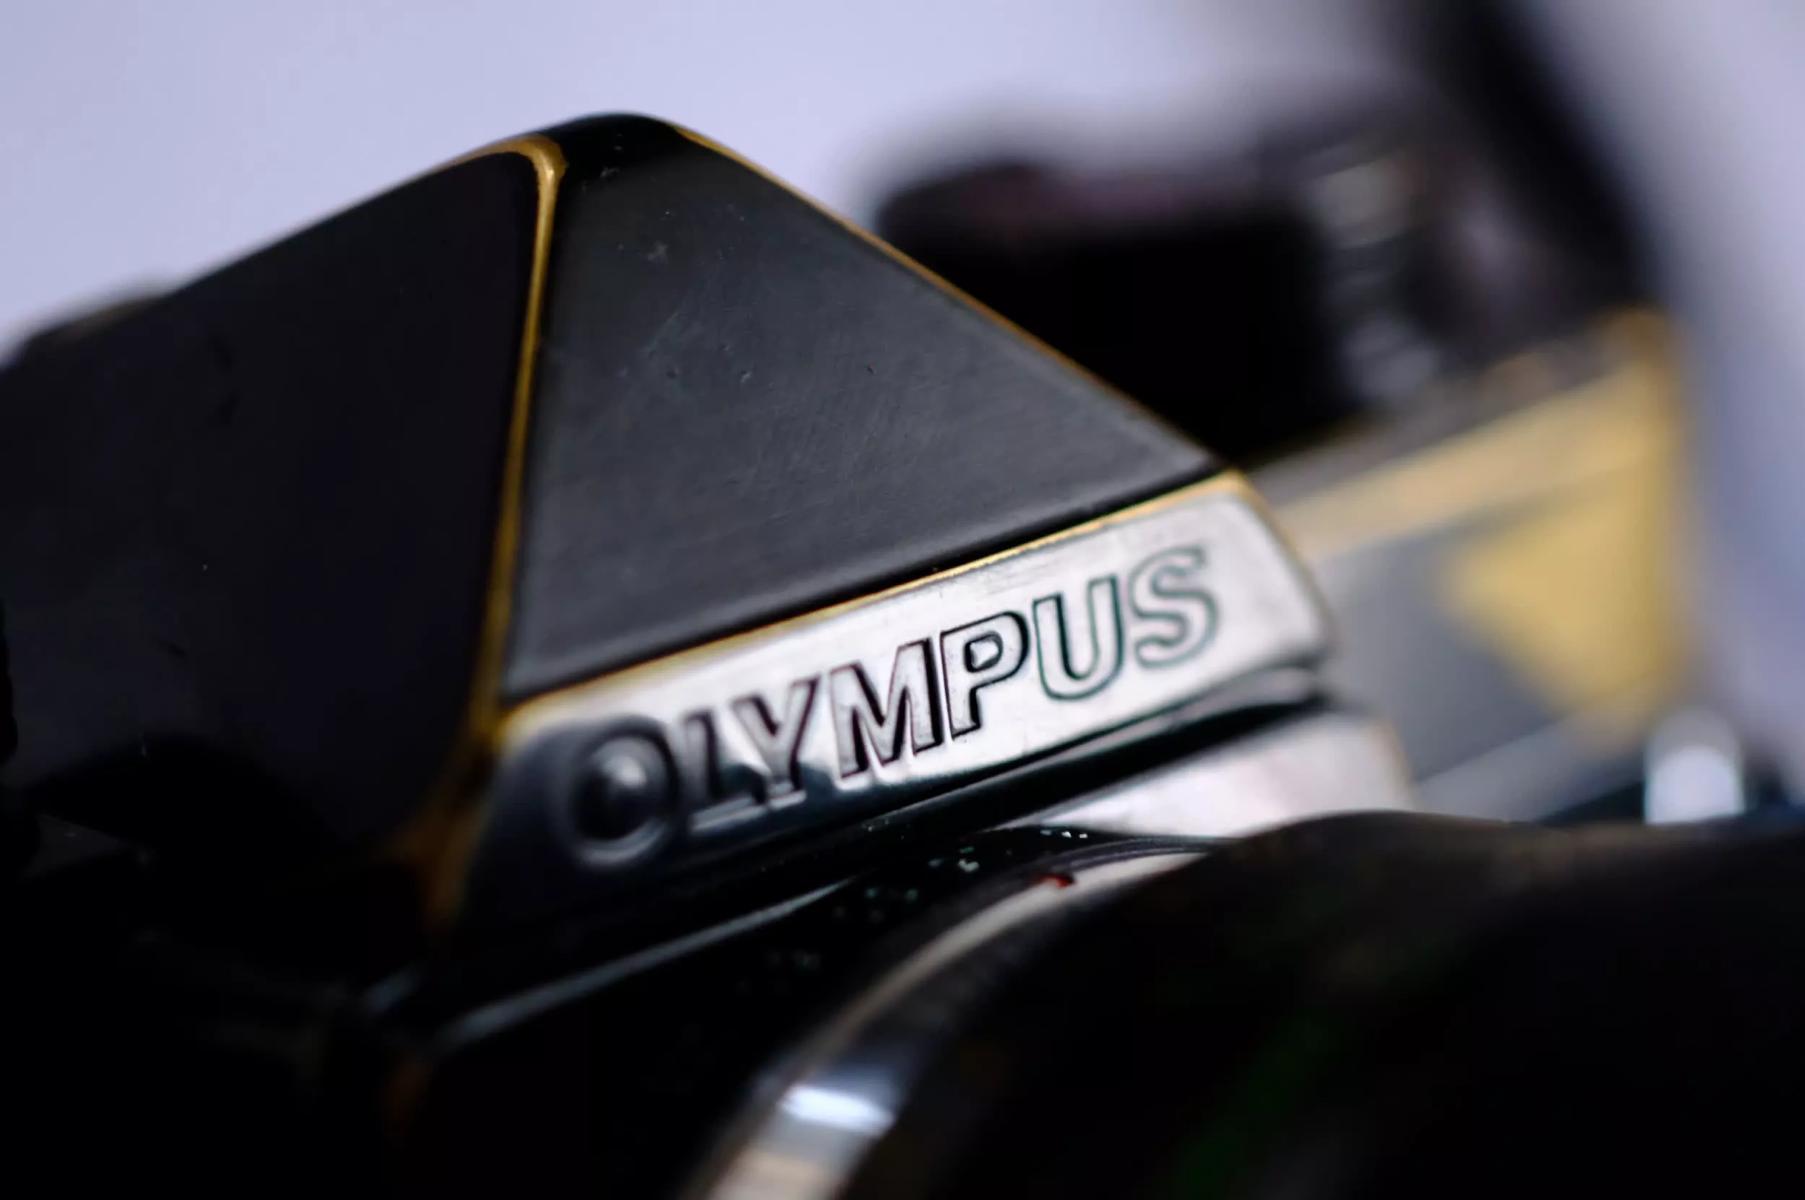 Флагман Samsung Galaxy S22 Ultra может получить 200 МП камеру от Olympus